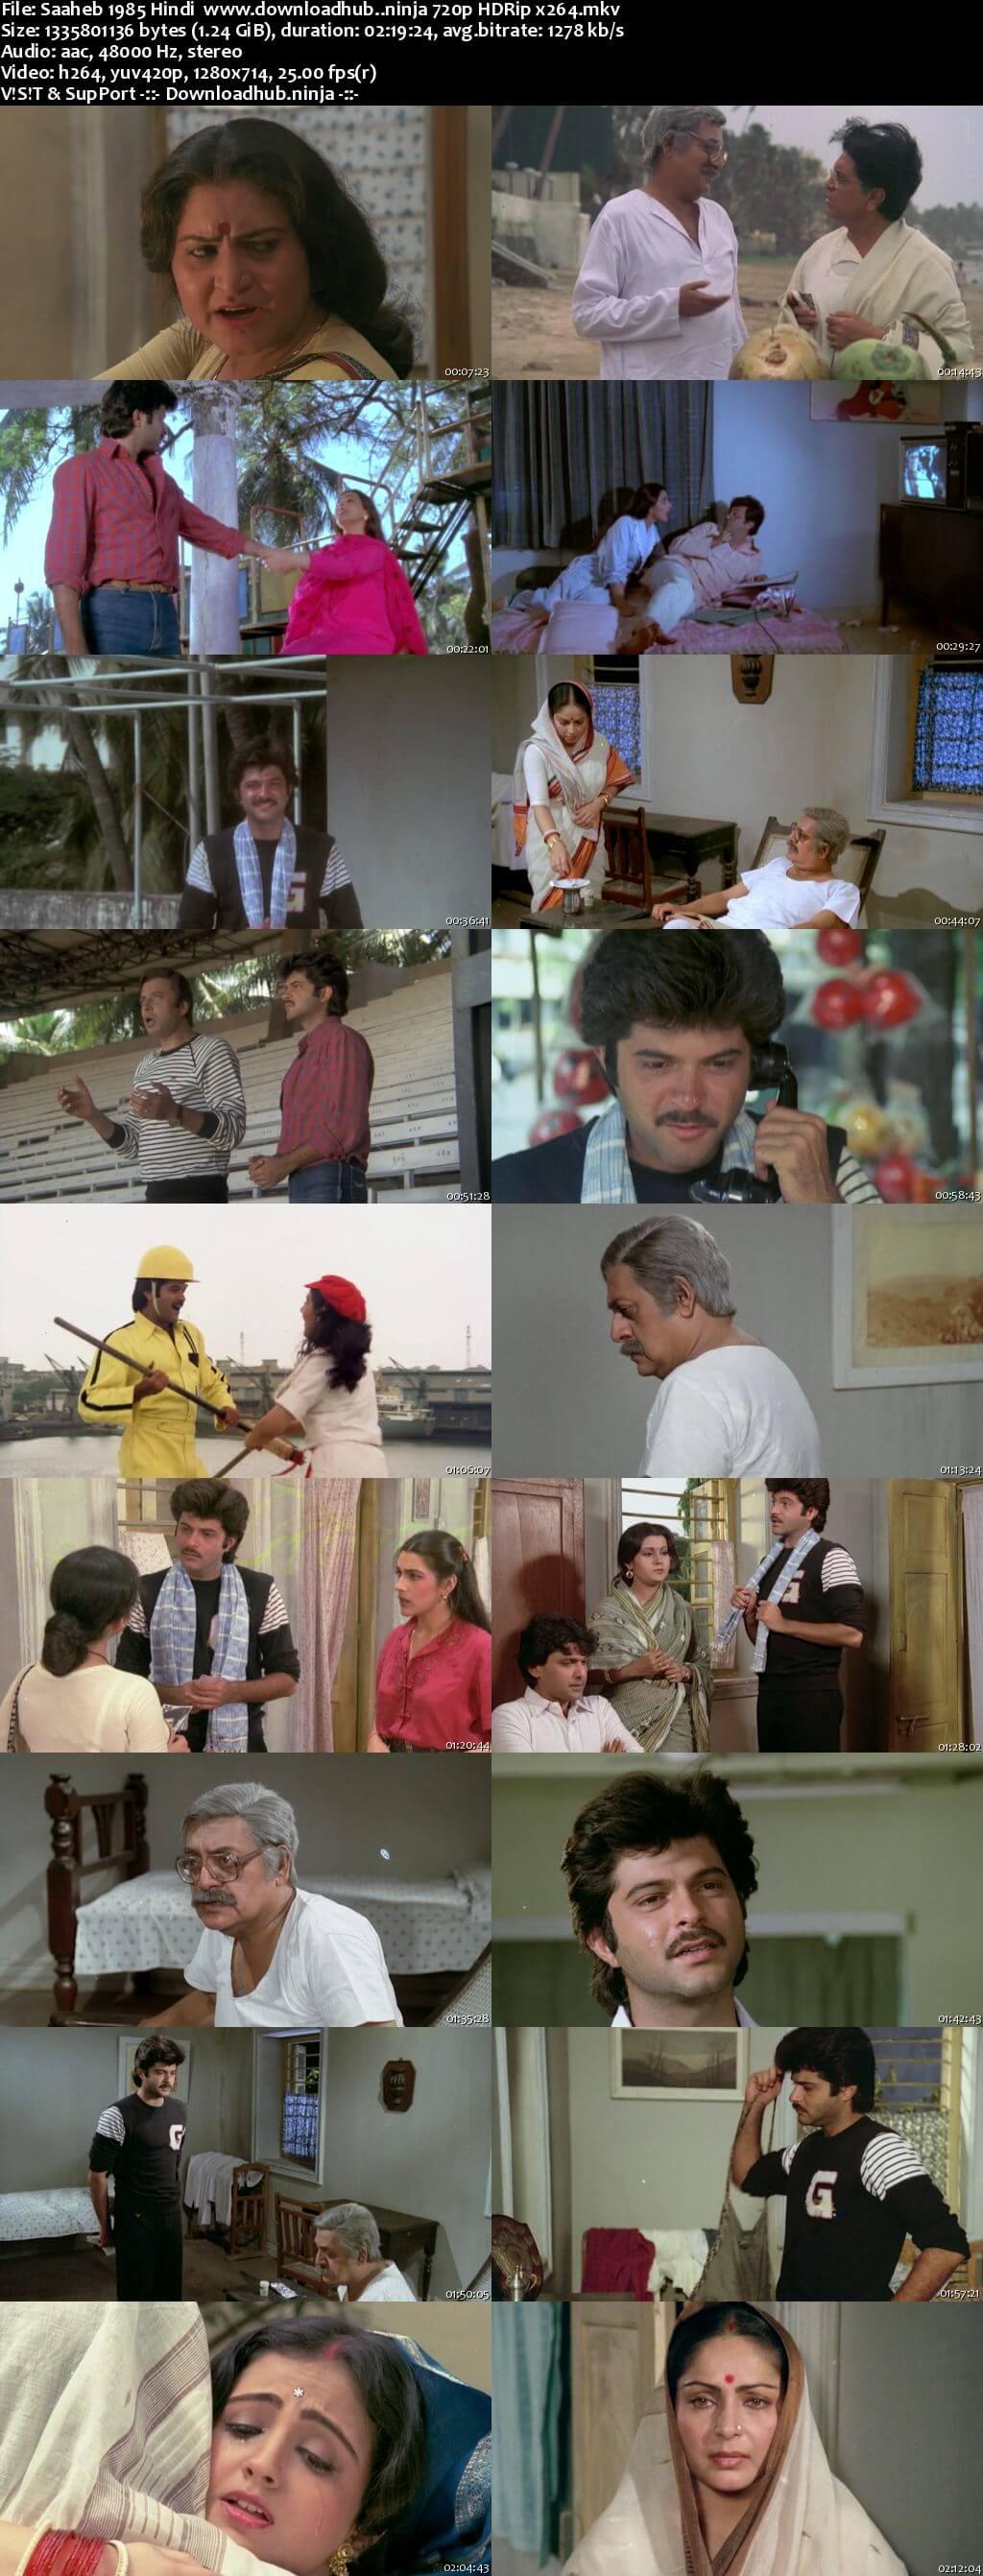 Saaheb 1985 Hindi 720p HDRip x264